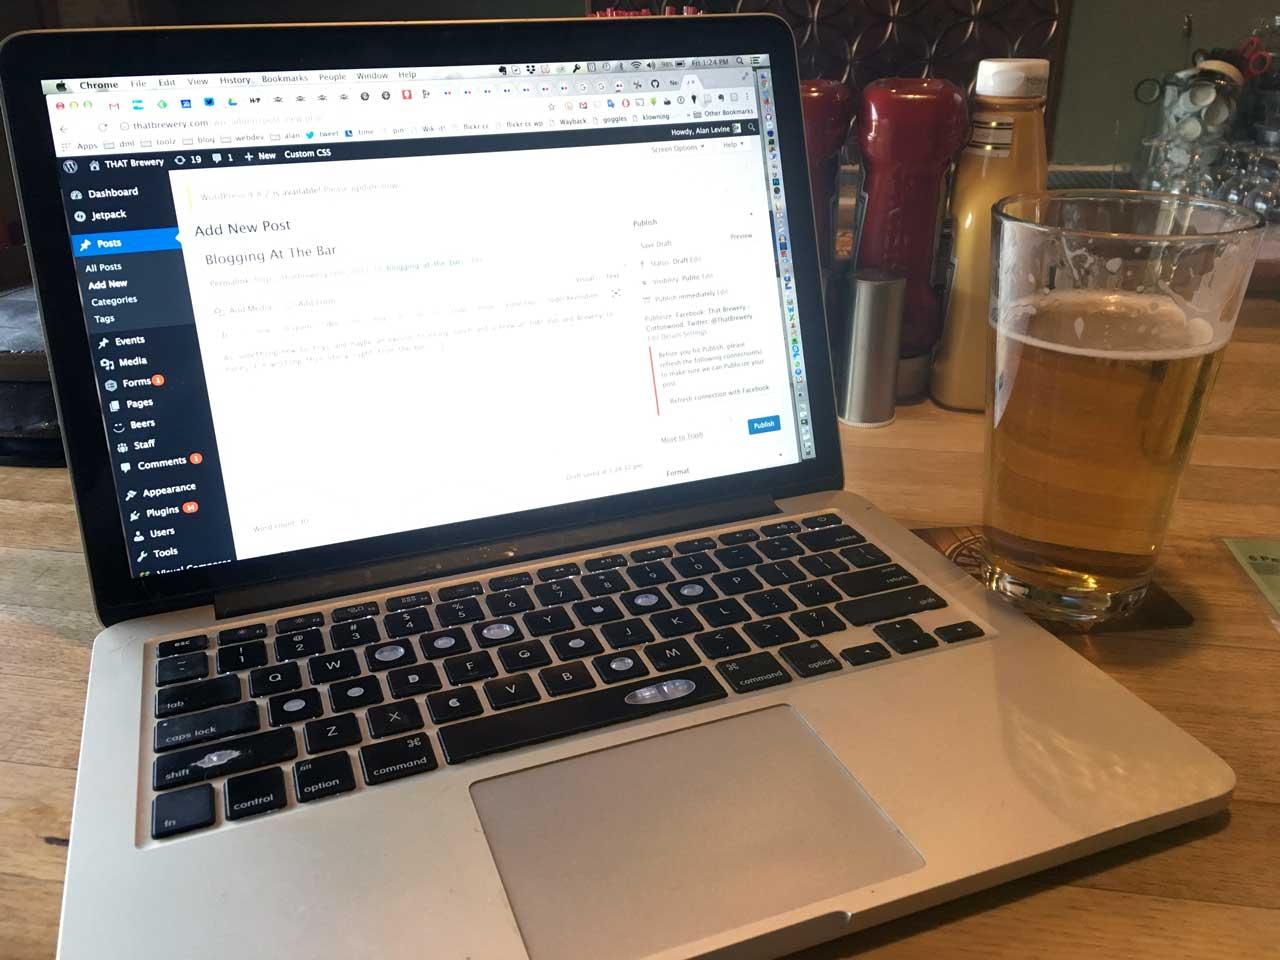 Blogging At The Bar